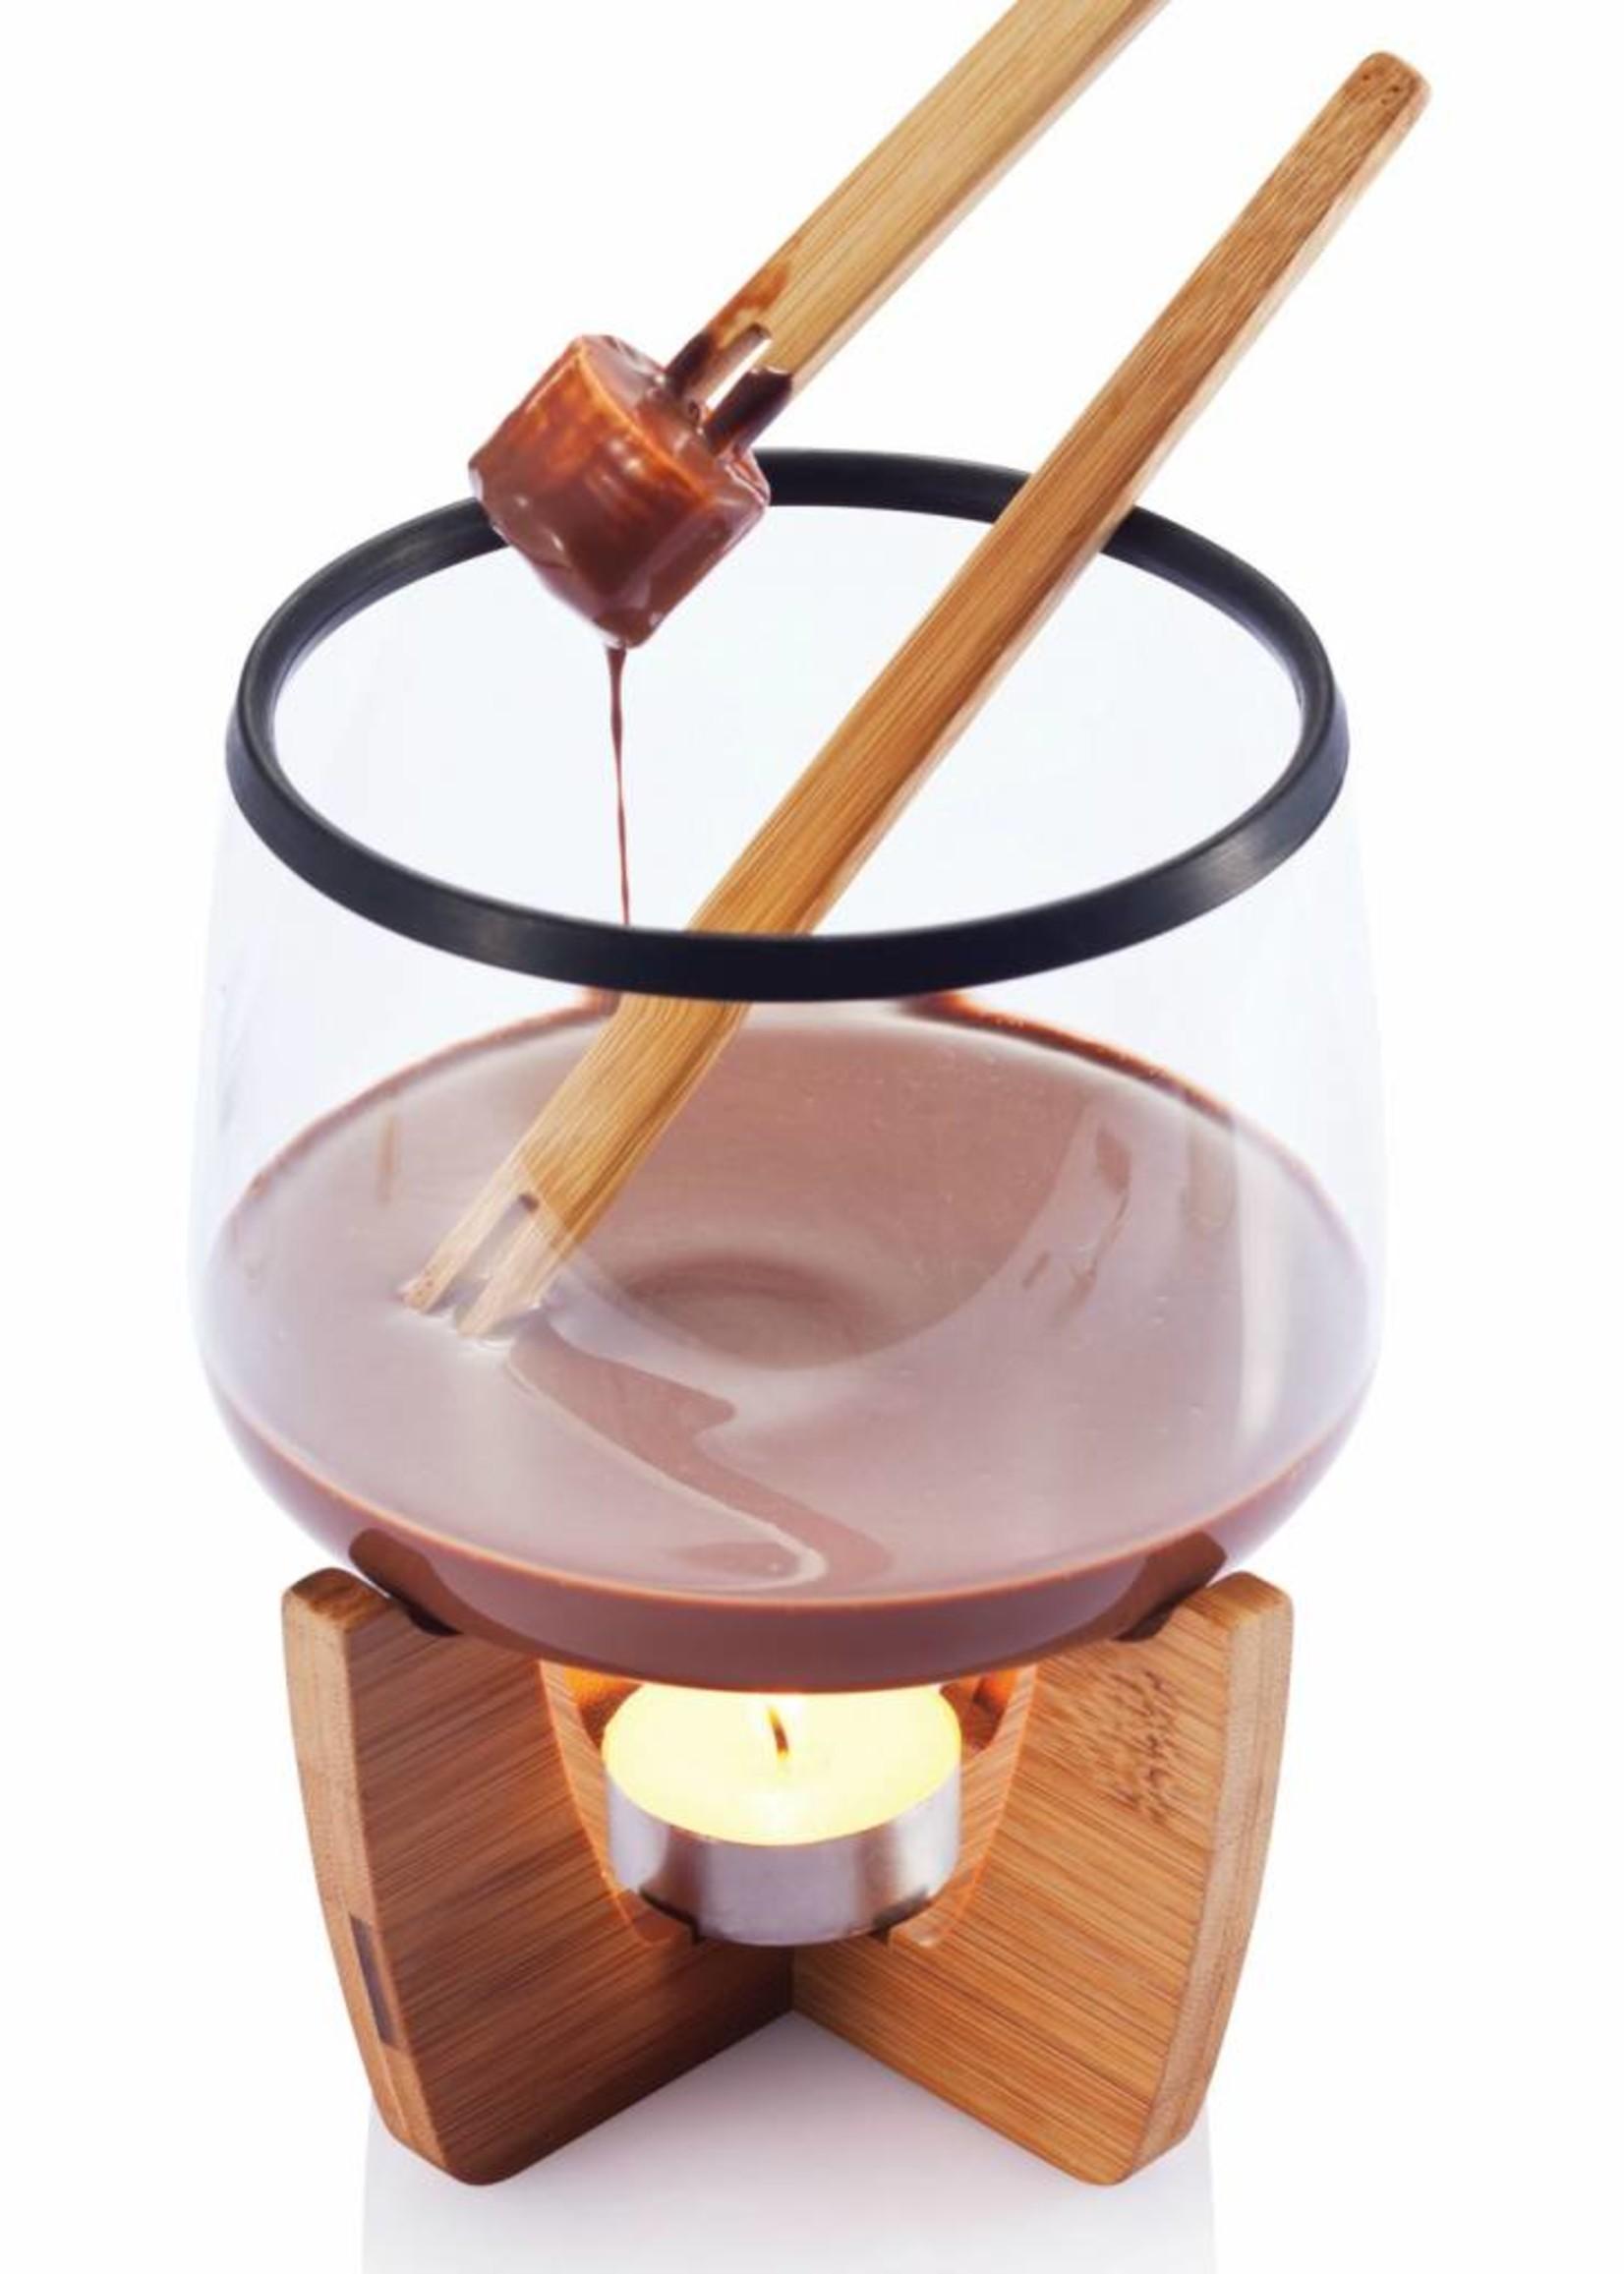 XD Design Cocoa chocolate fondue set